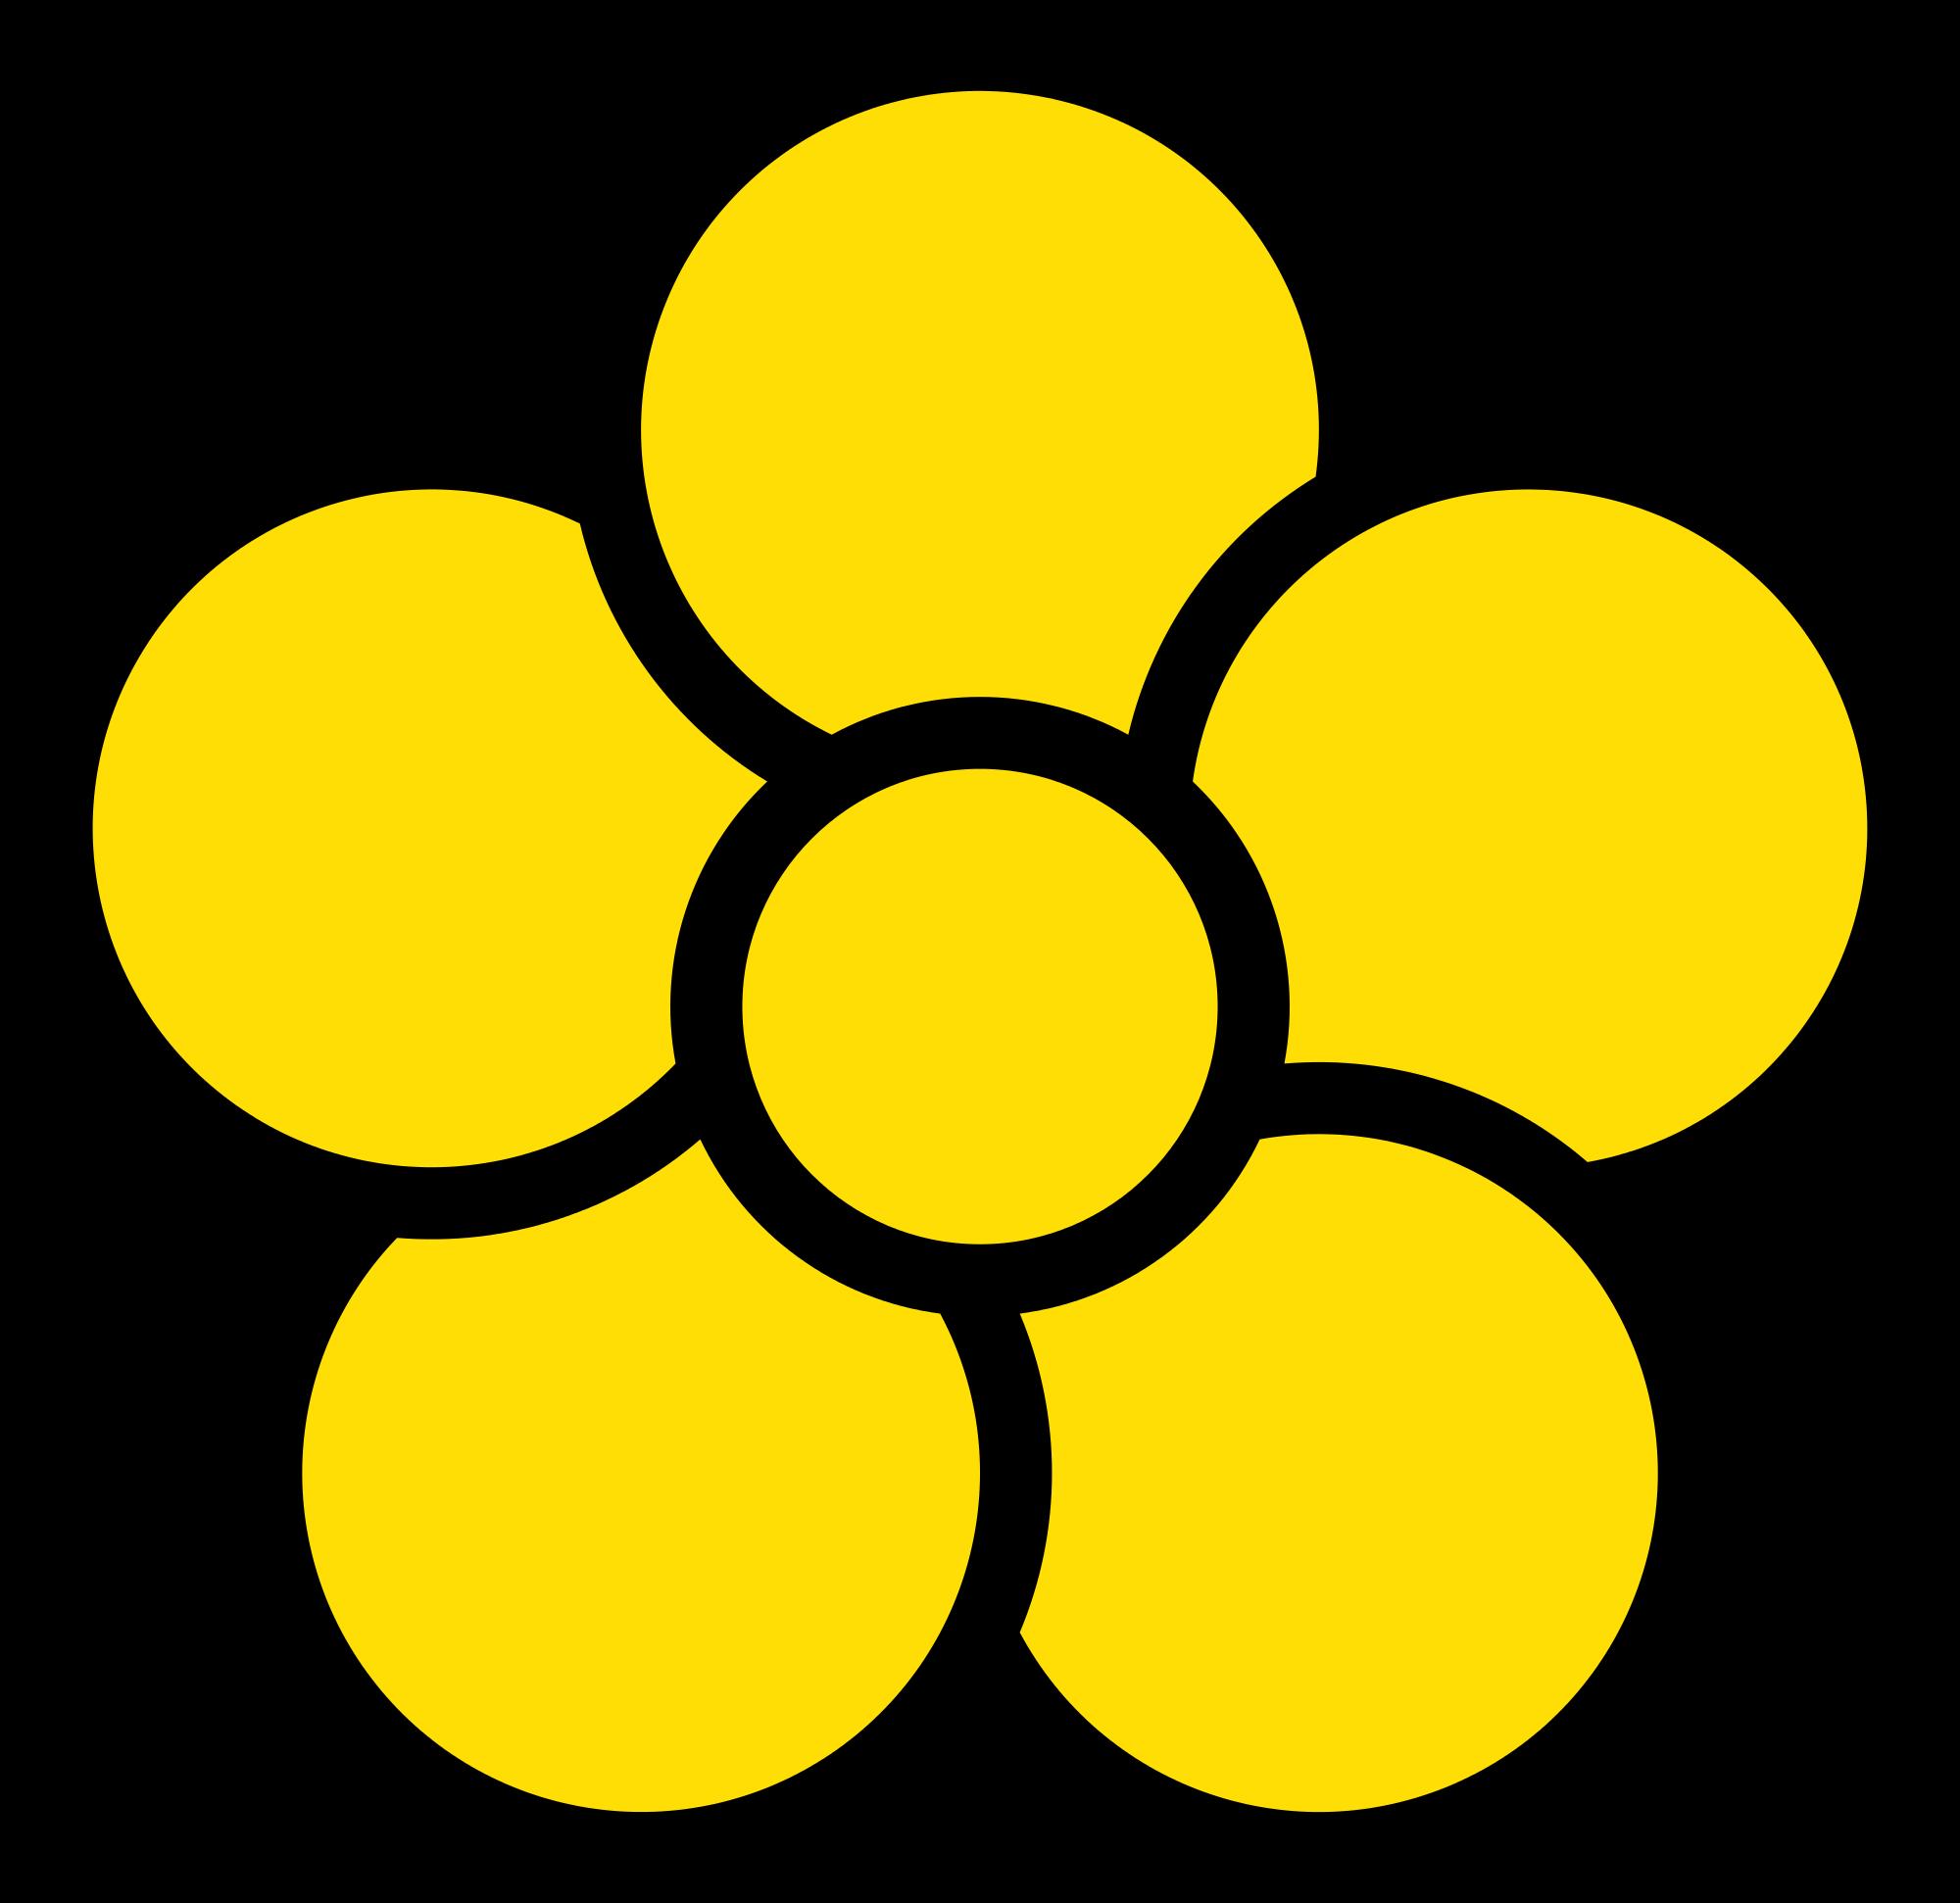 5 Petal Flower Drawing at GetDrawings.com.